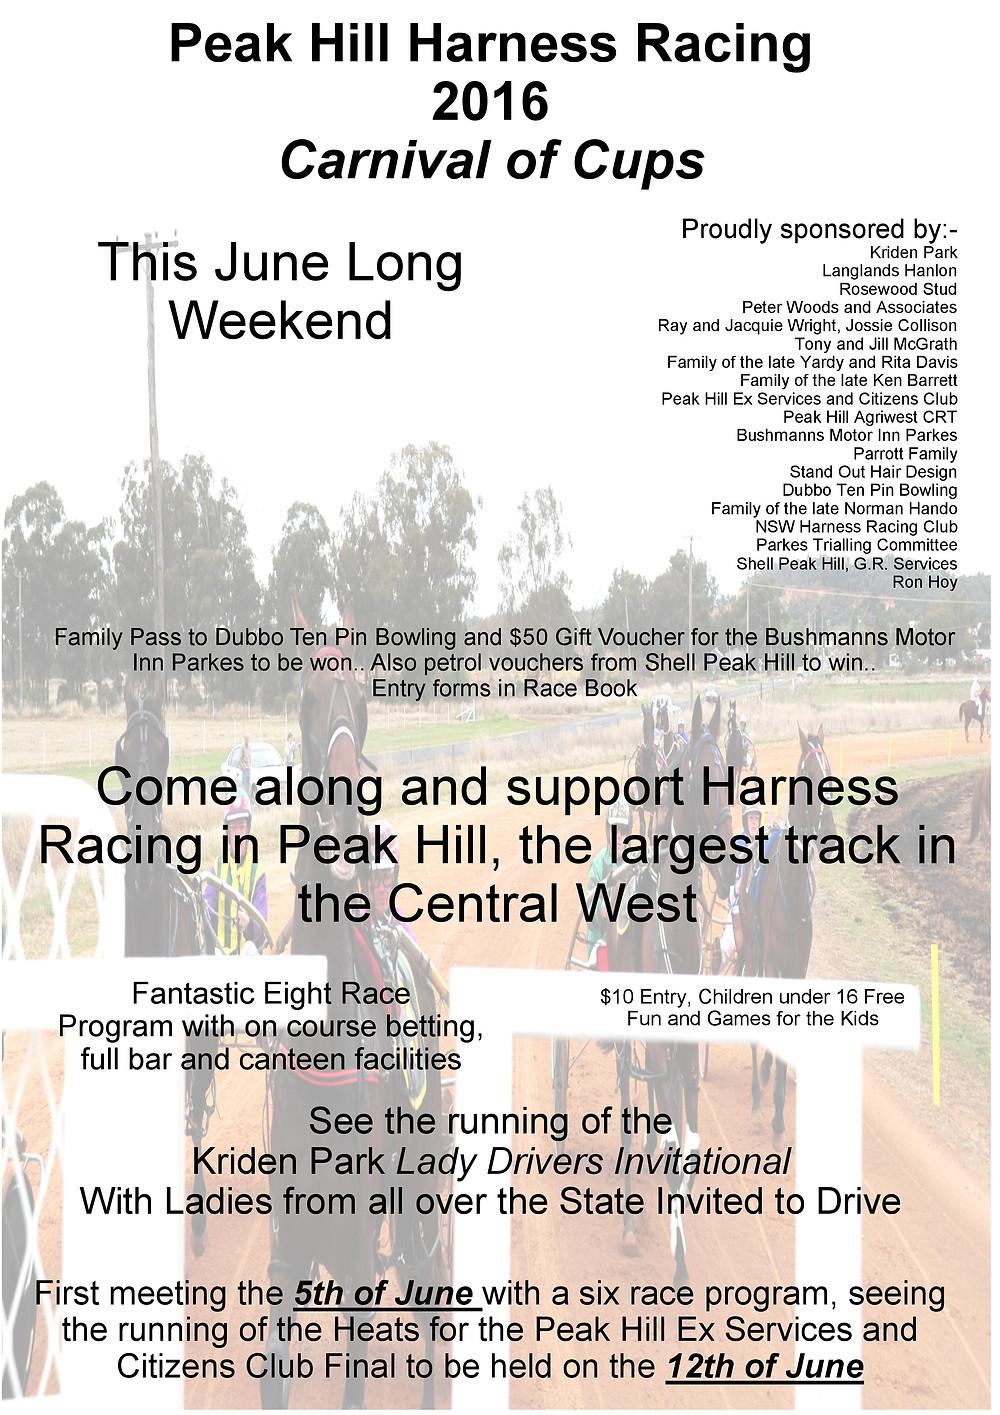 Peak Hill Harness Racing Club Carnival Of Cups 2016